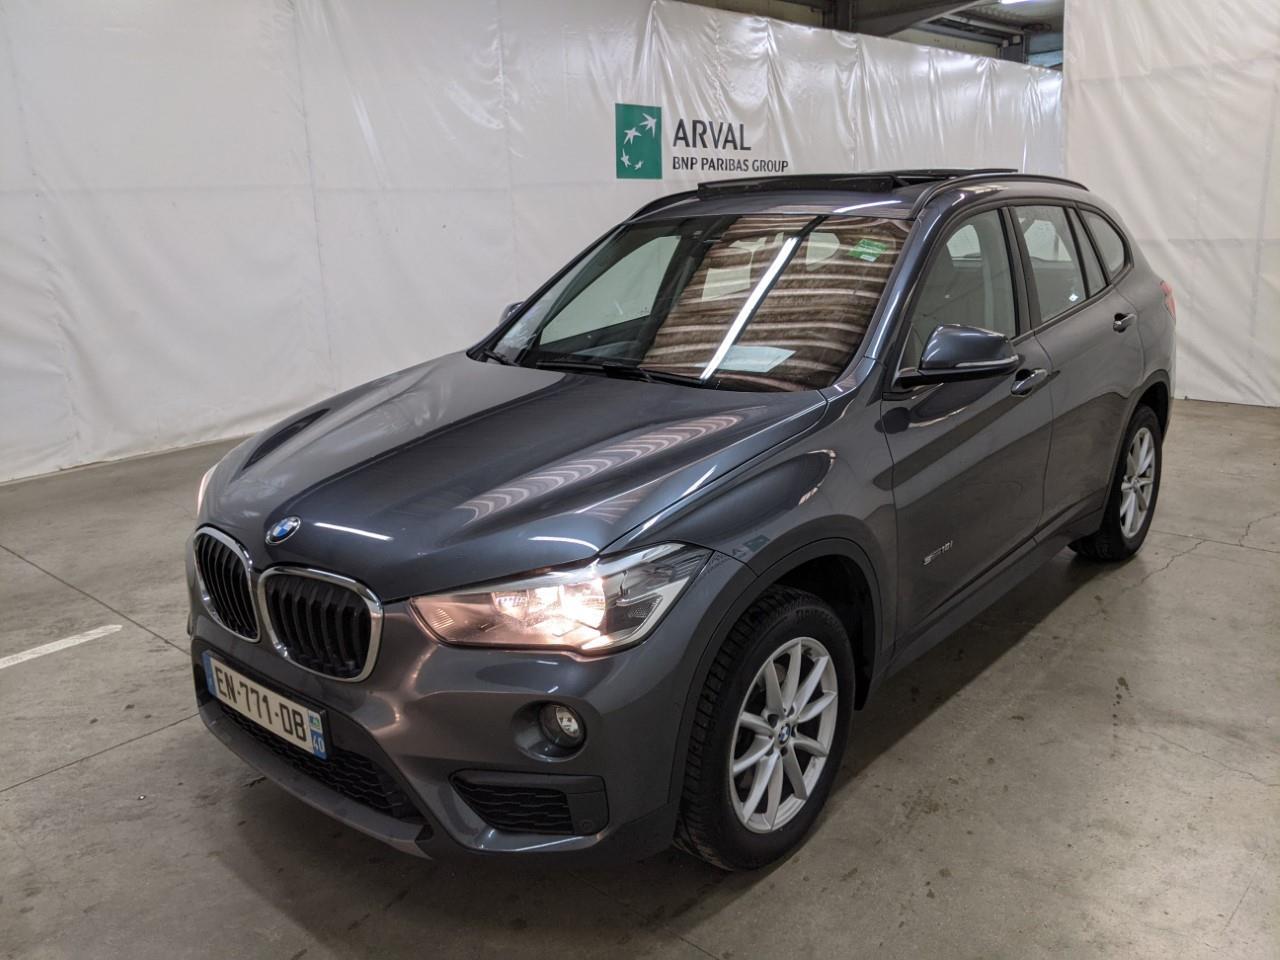 BMW X1 BMW X1 5p SUV sDrive18i Business BVA6